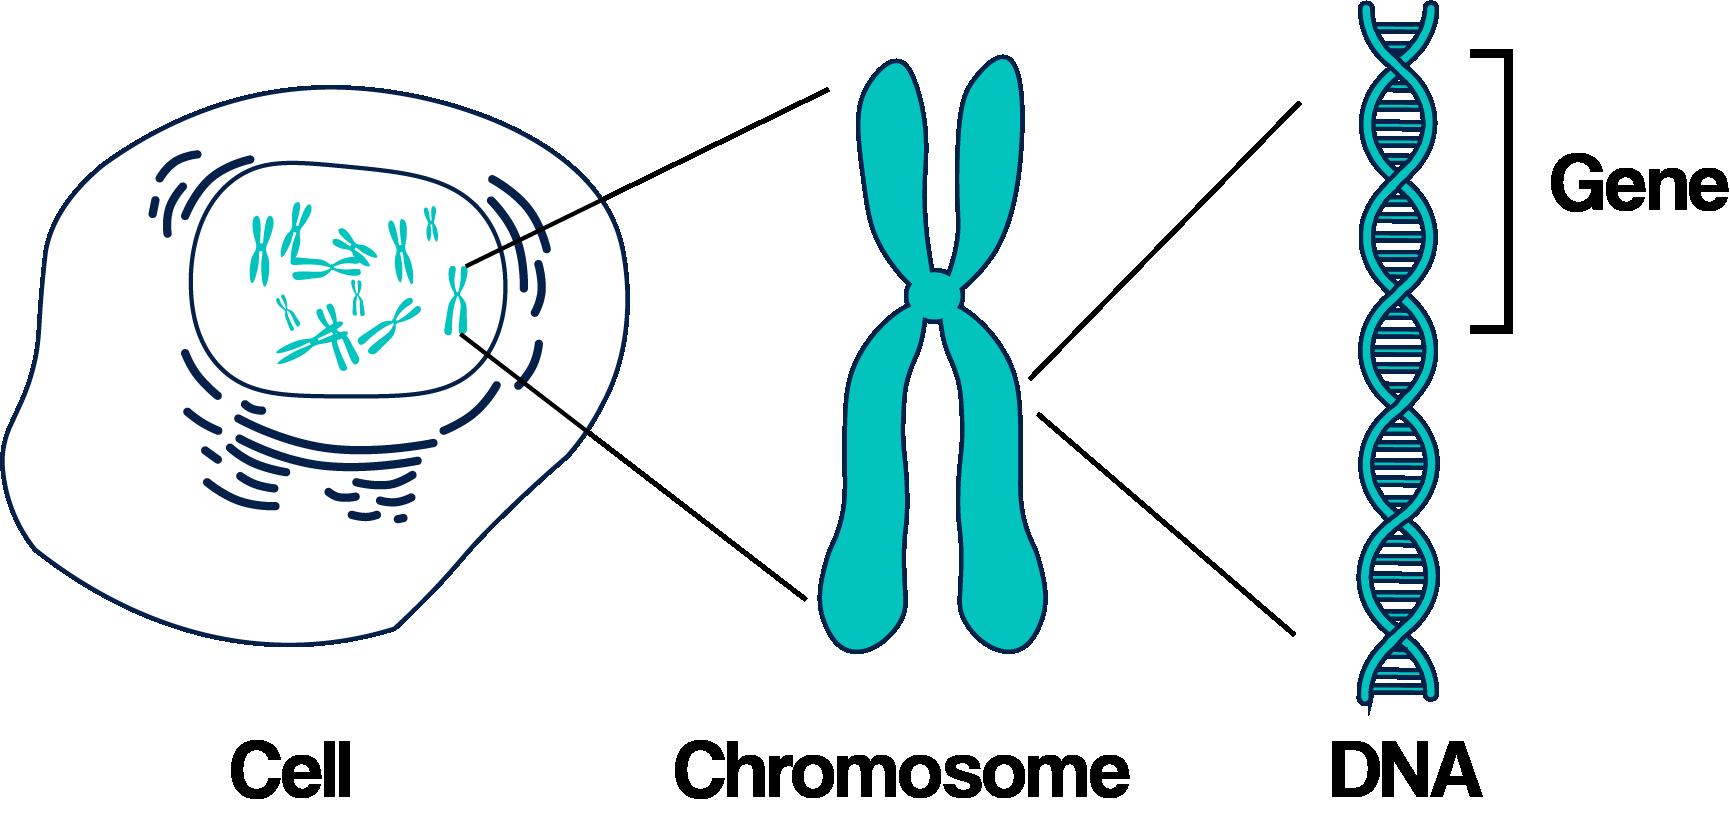 Chromosome graphic